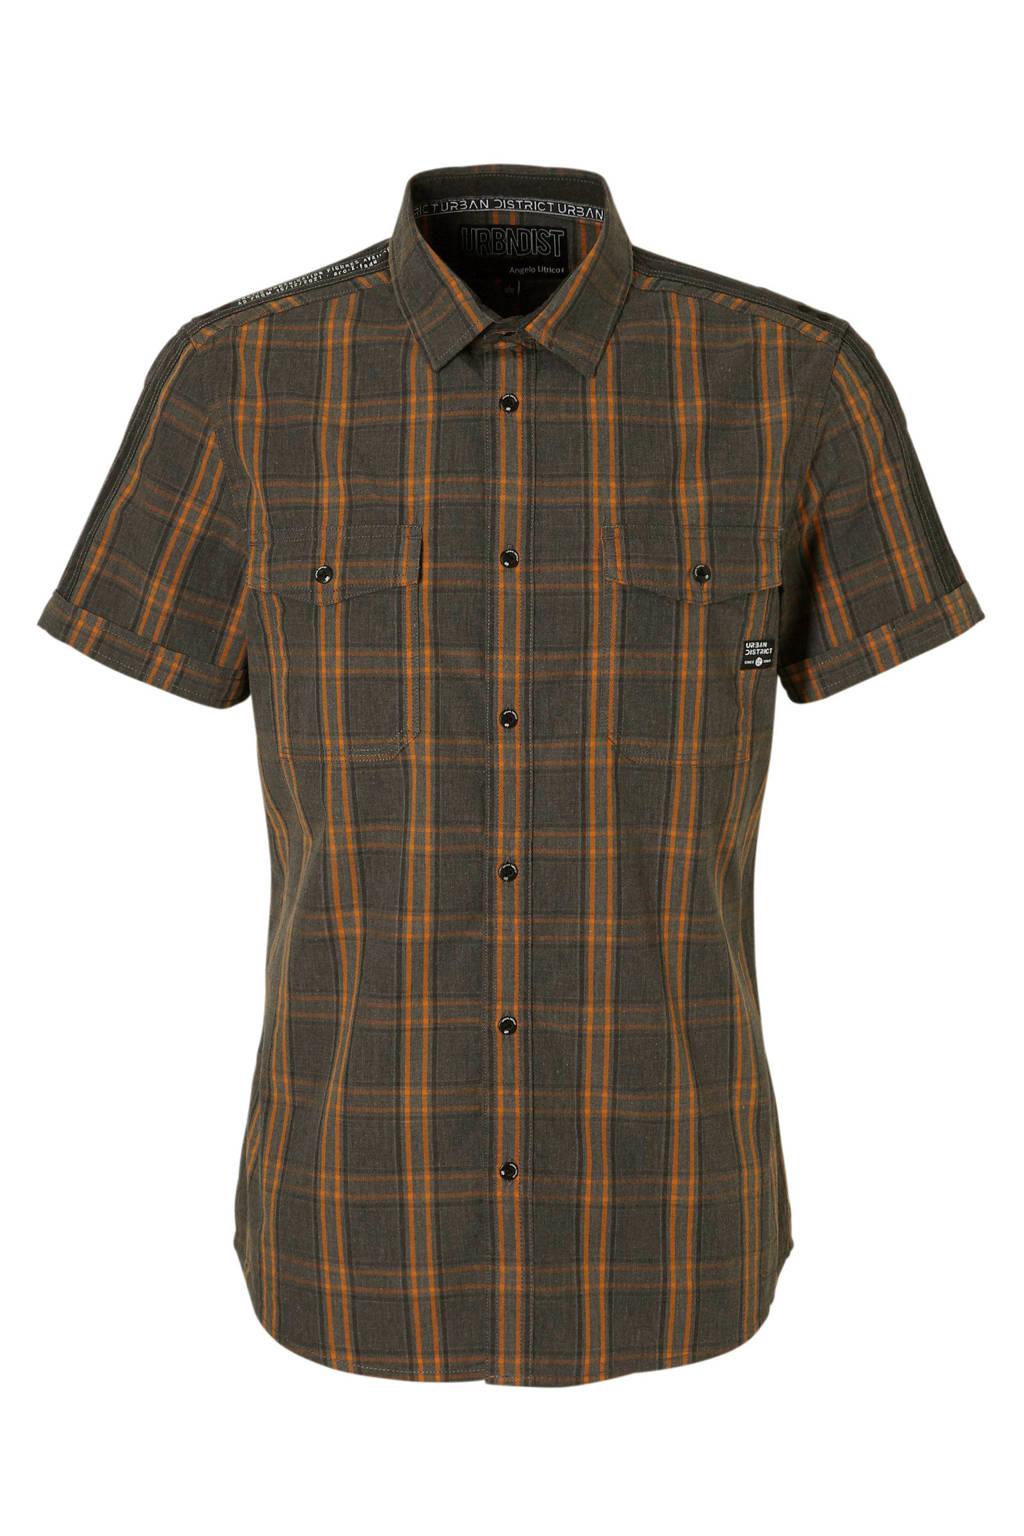 C&A Angelo Litrico geruit overhemd grijs, Grijs/oranje